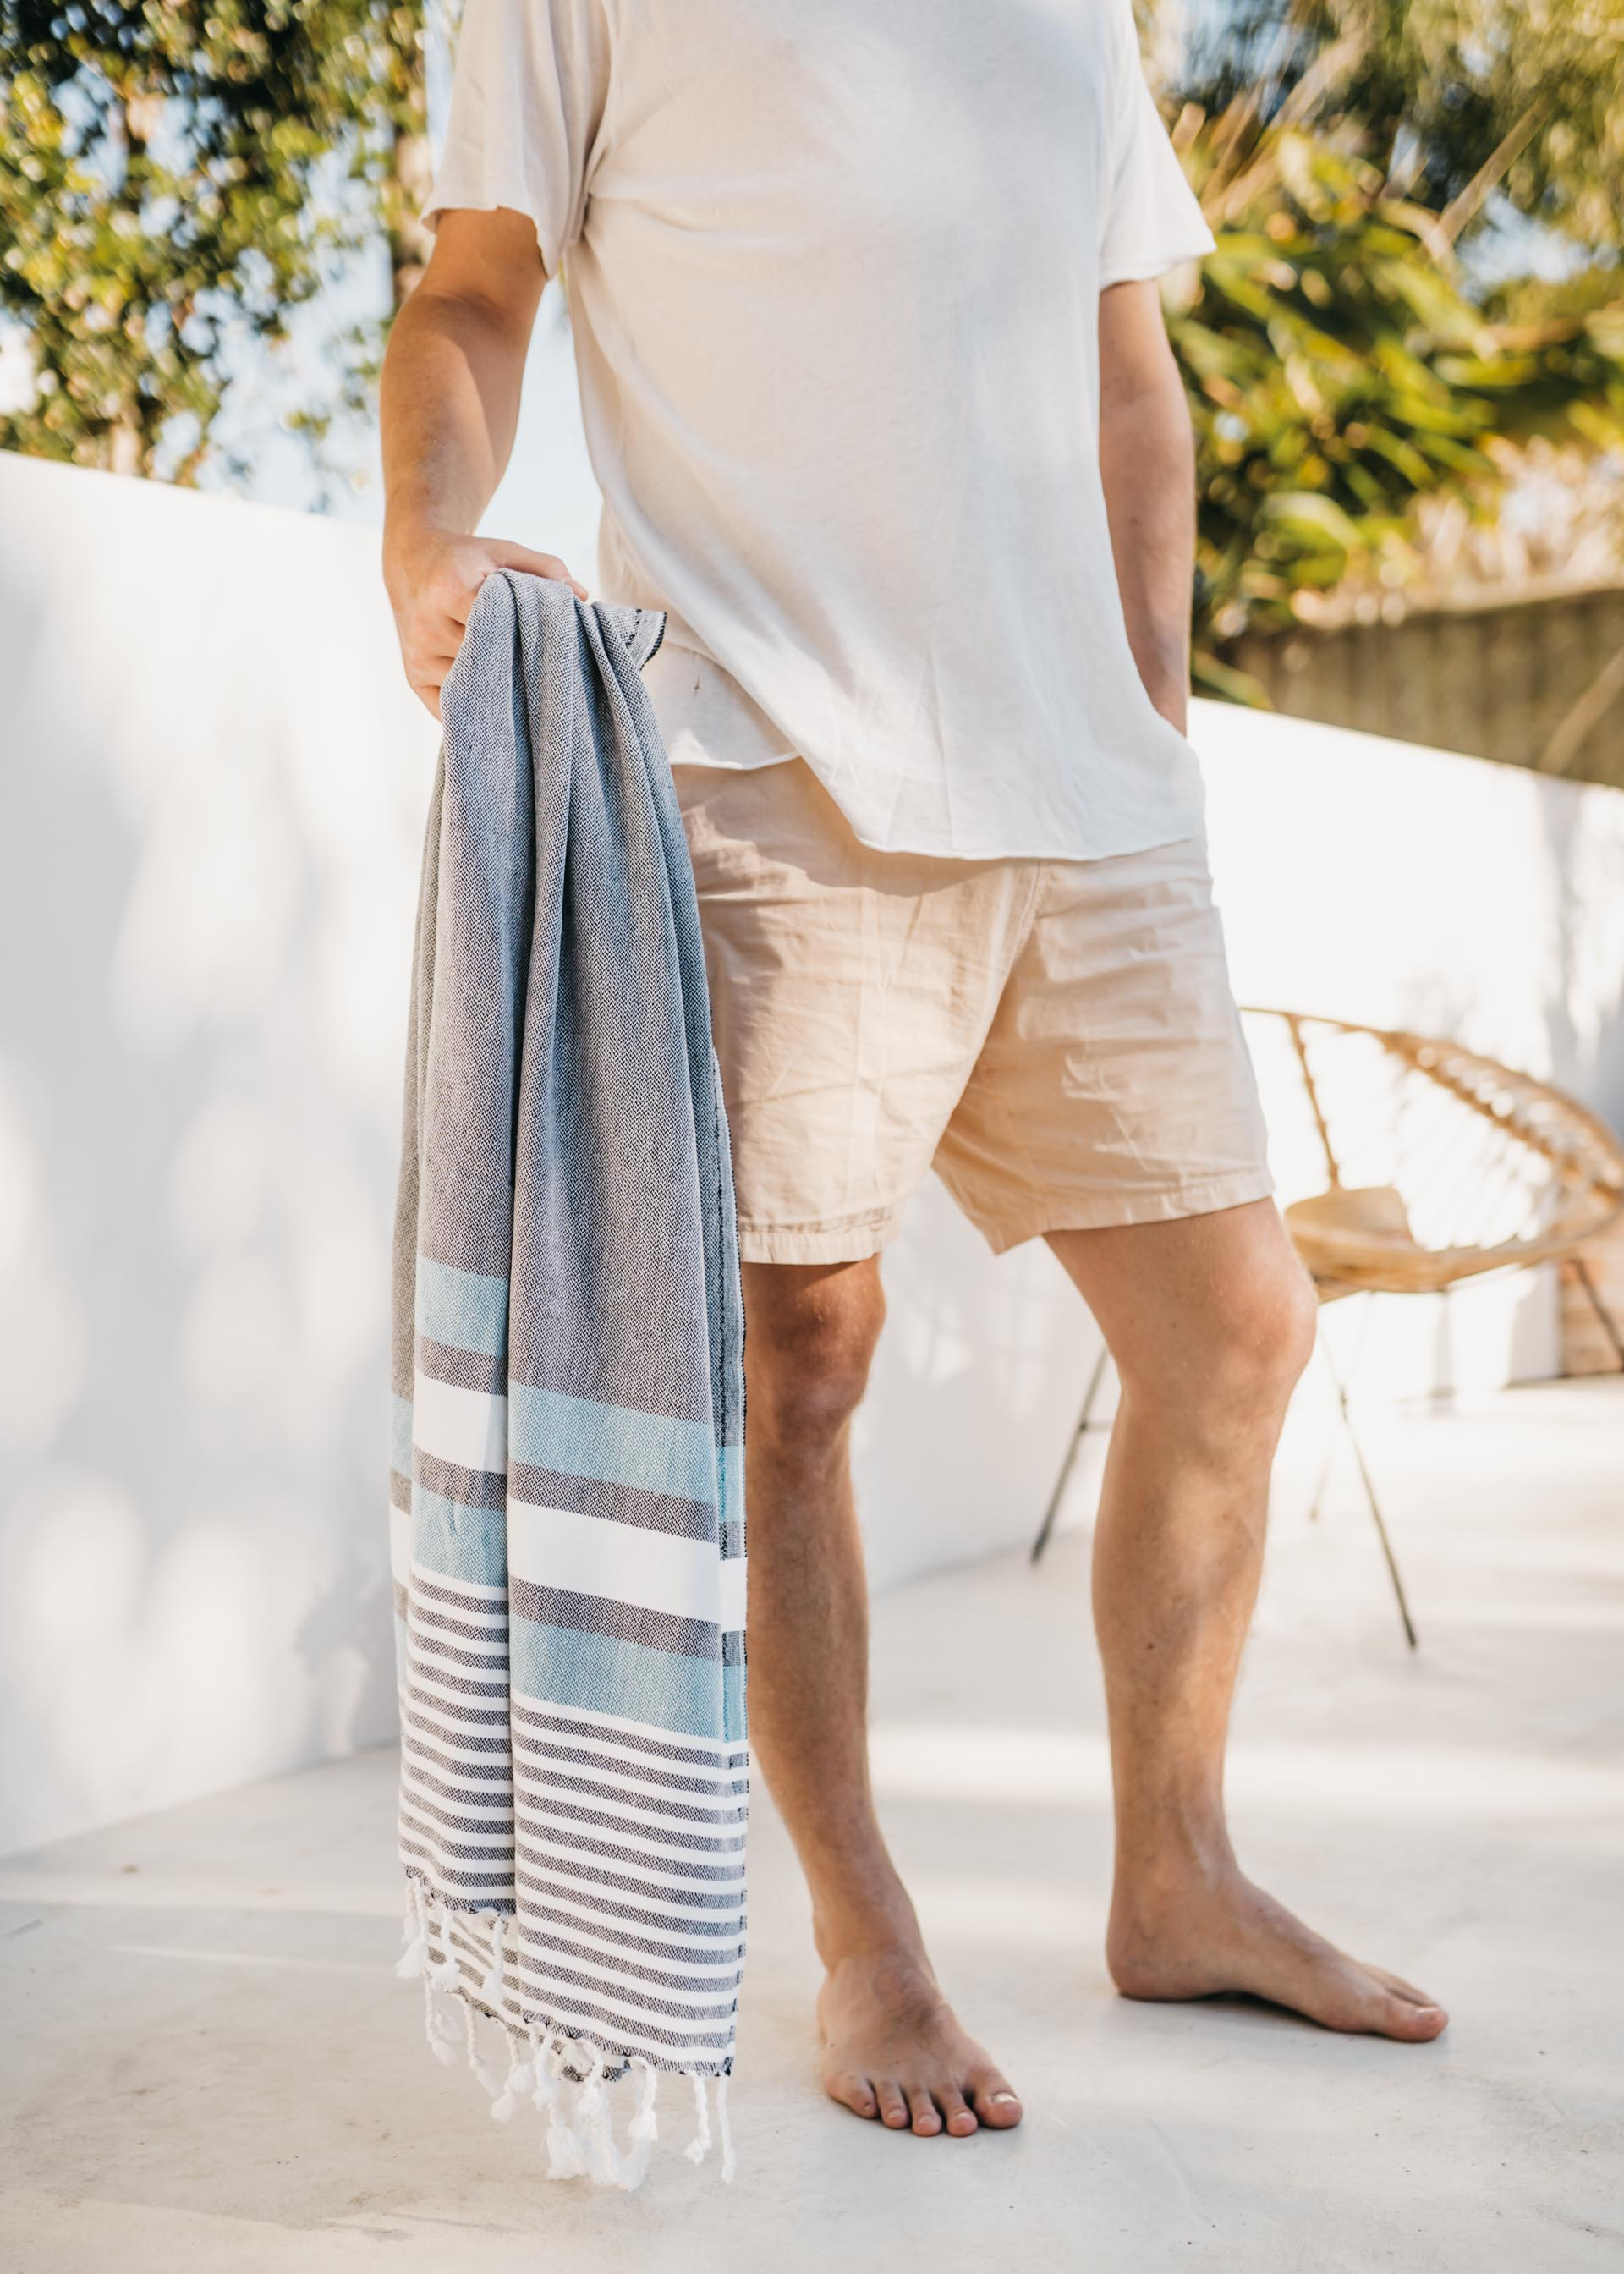 keira-mason-aegean-loom-turkish-towels-blue-man.jpg